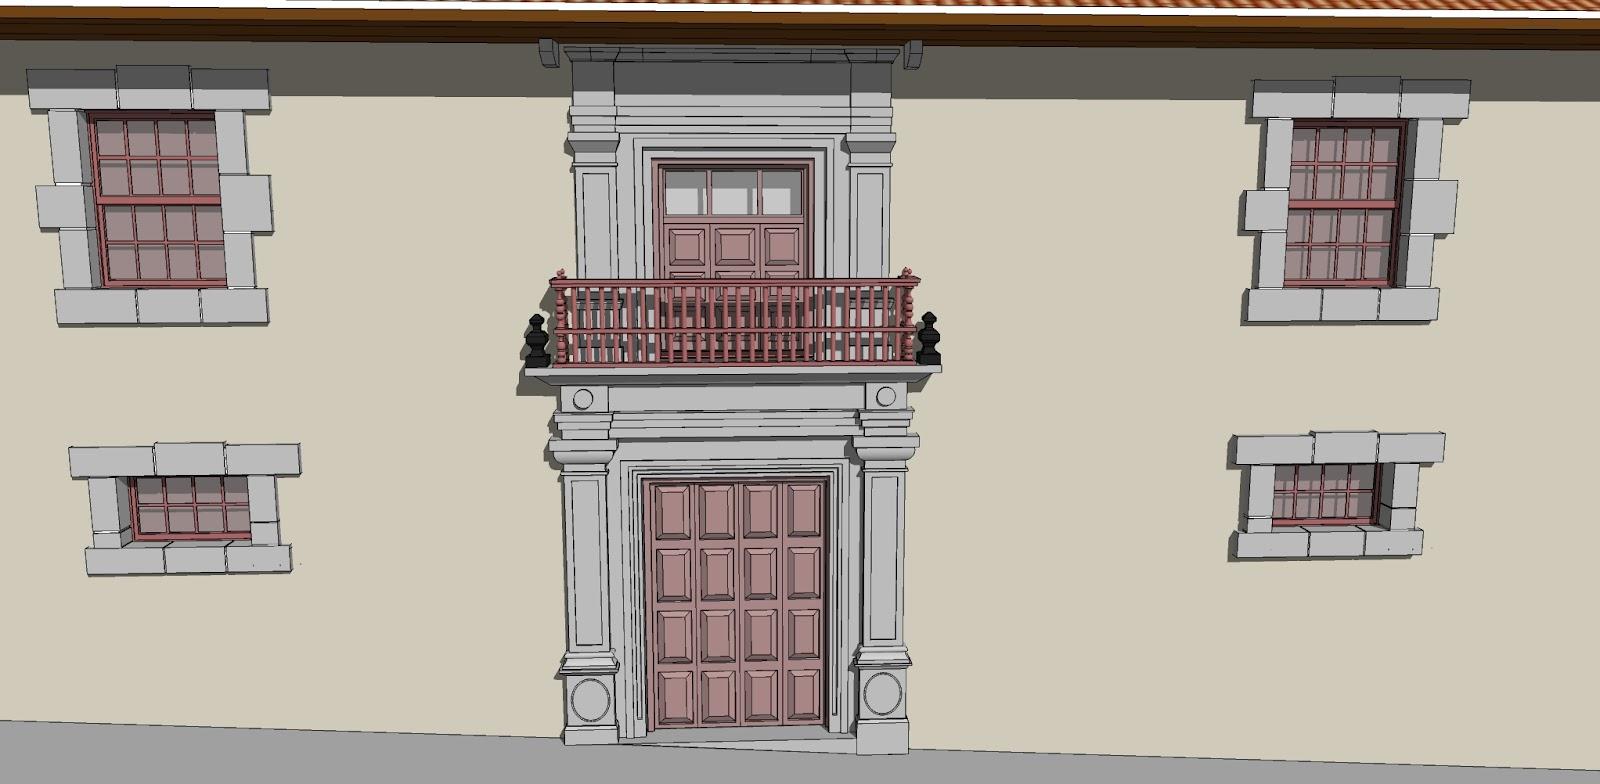 Arquitectura hist rica en tenerife espa a casa molina la orotava tenerife - Trabajo desde casa tenerife ...